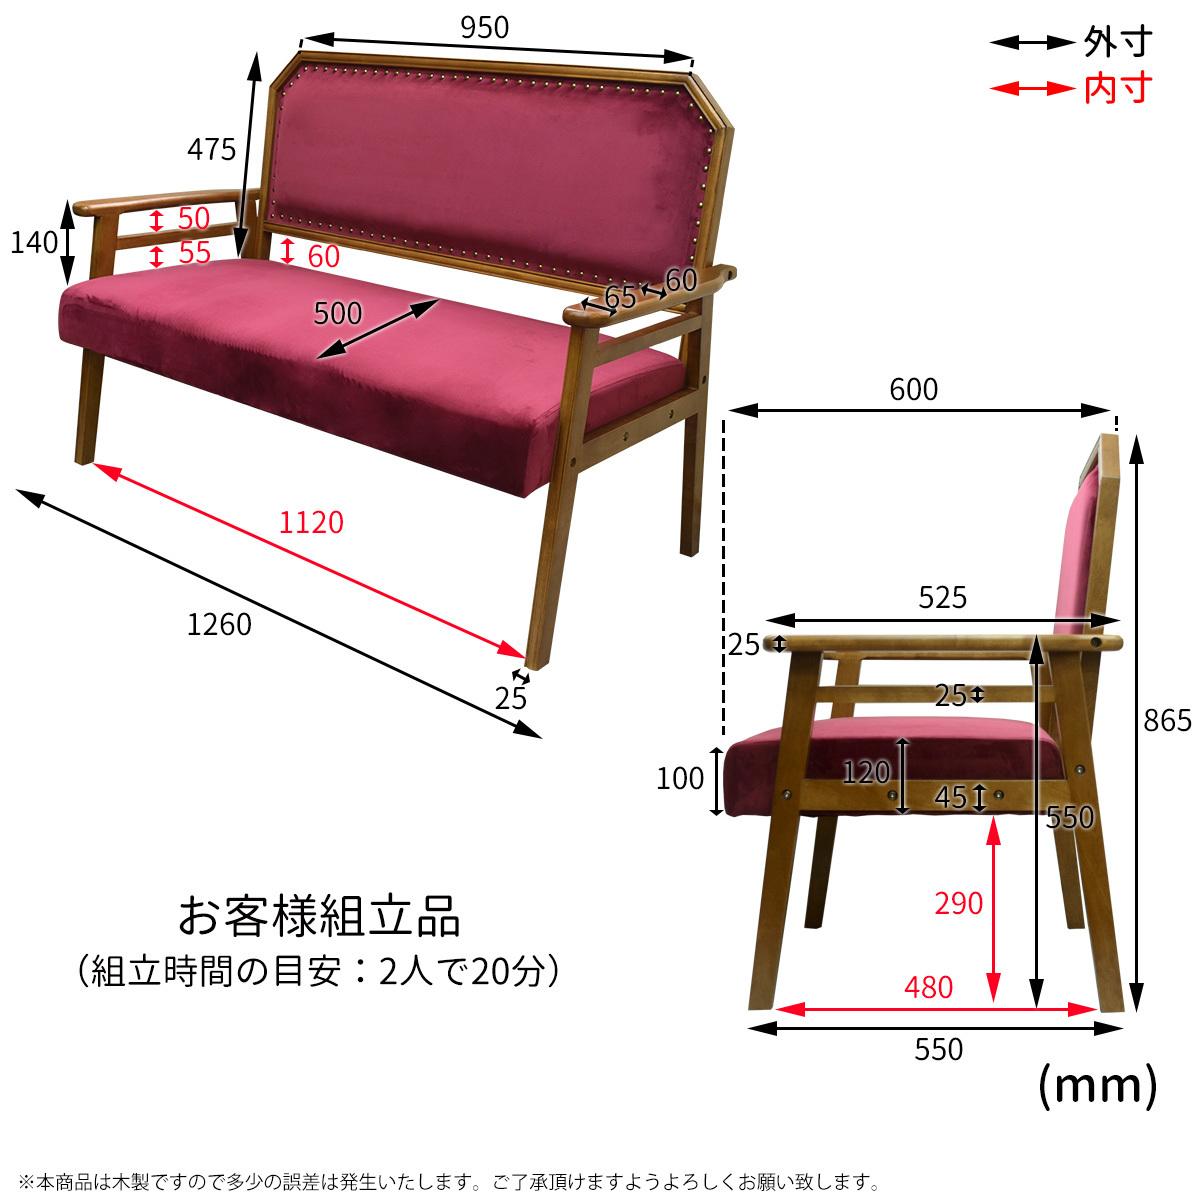 JP Modern 2P Sofa RD / 和モダンスタイル モダン 2人用 ソファ / レッド